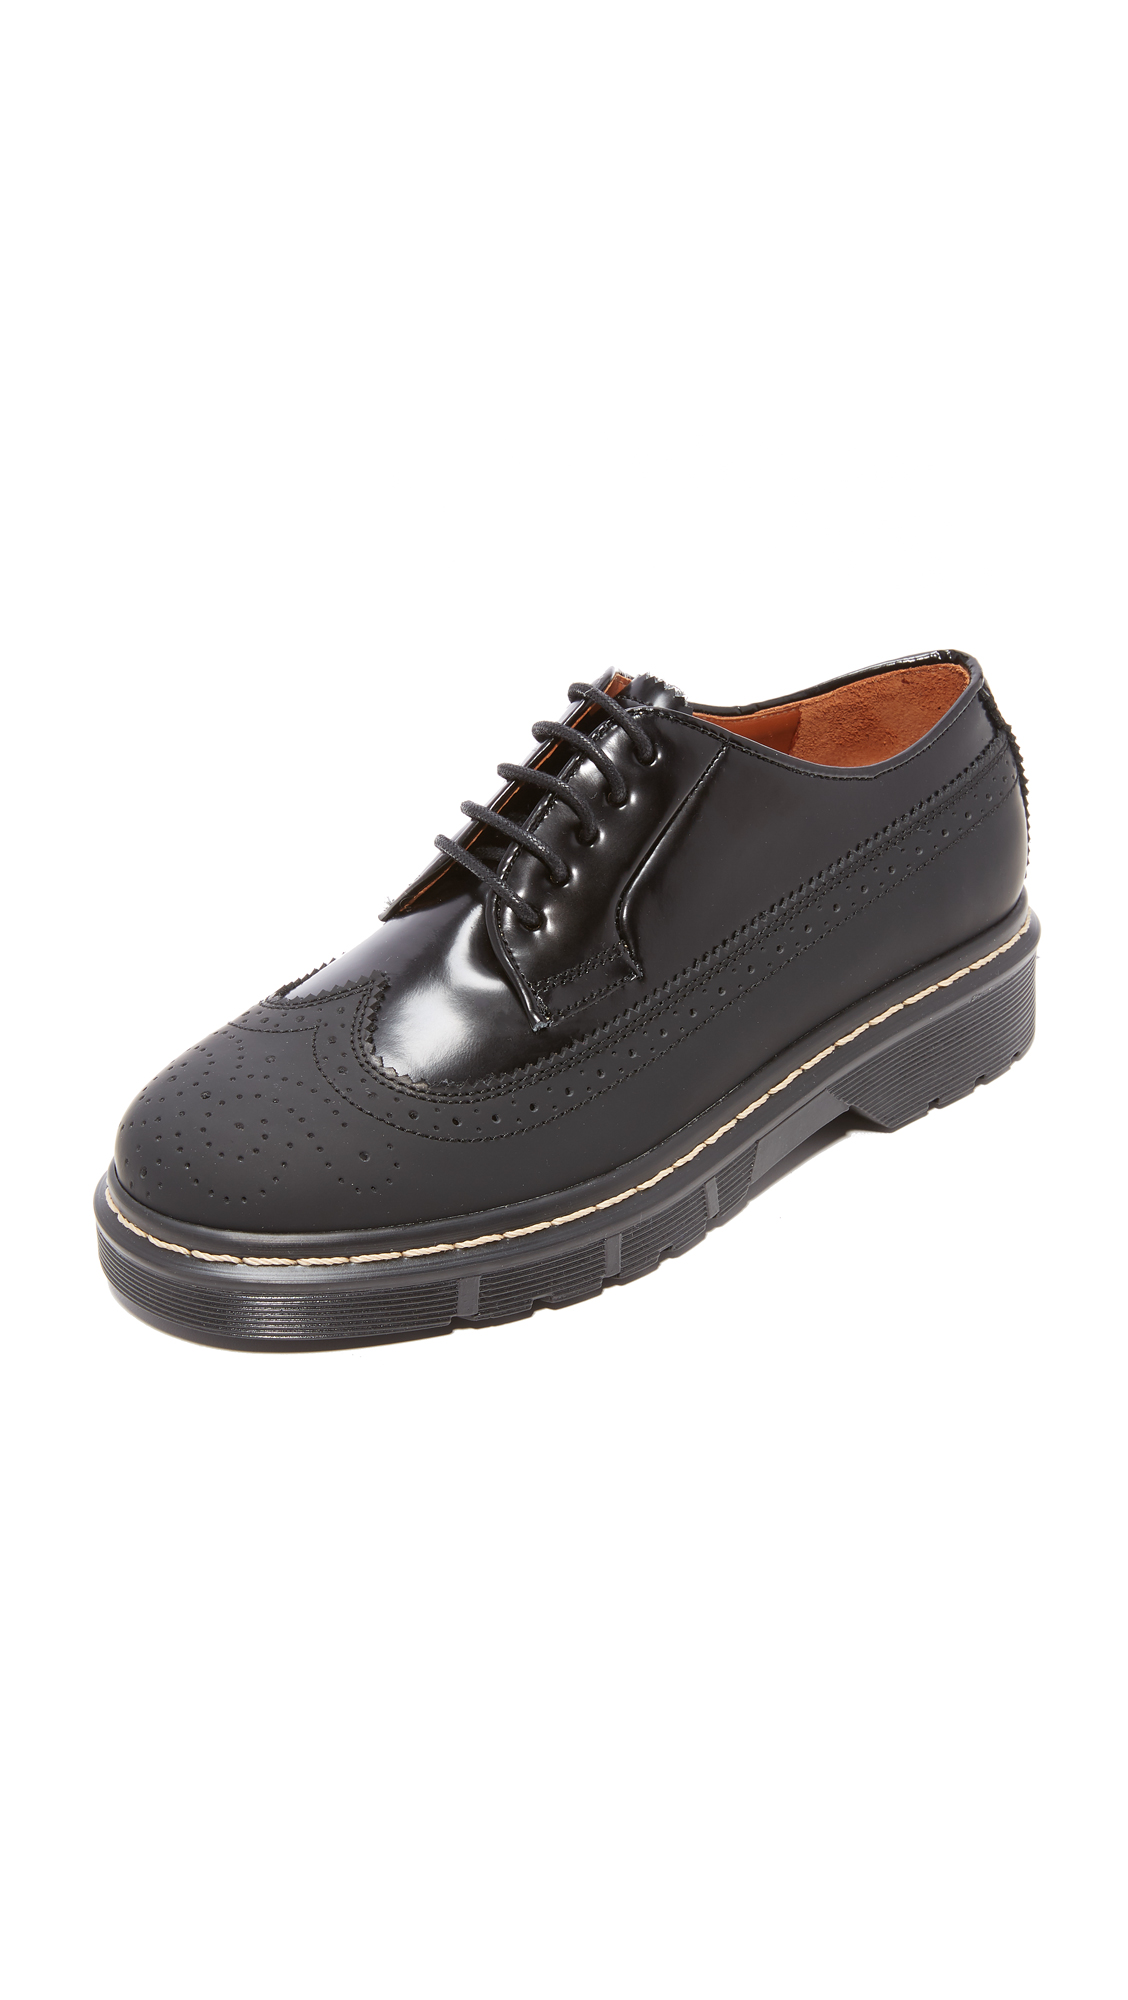 Joseph Dennis Rubber Brogue Shoes - Nero